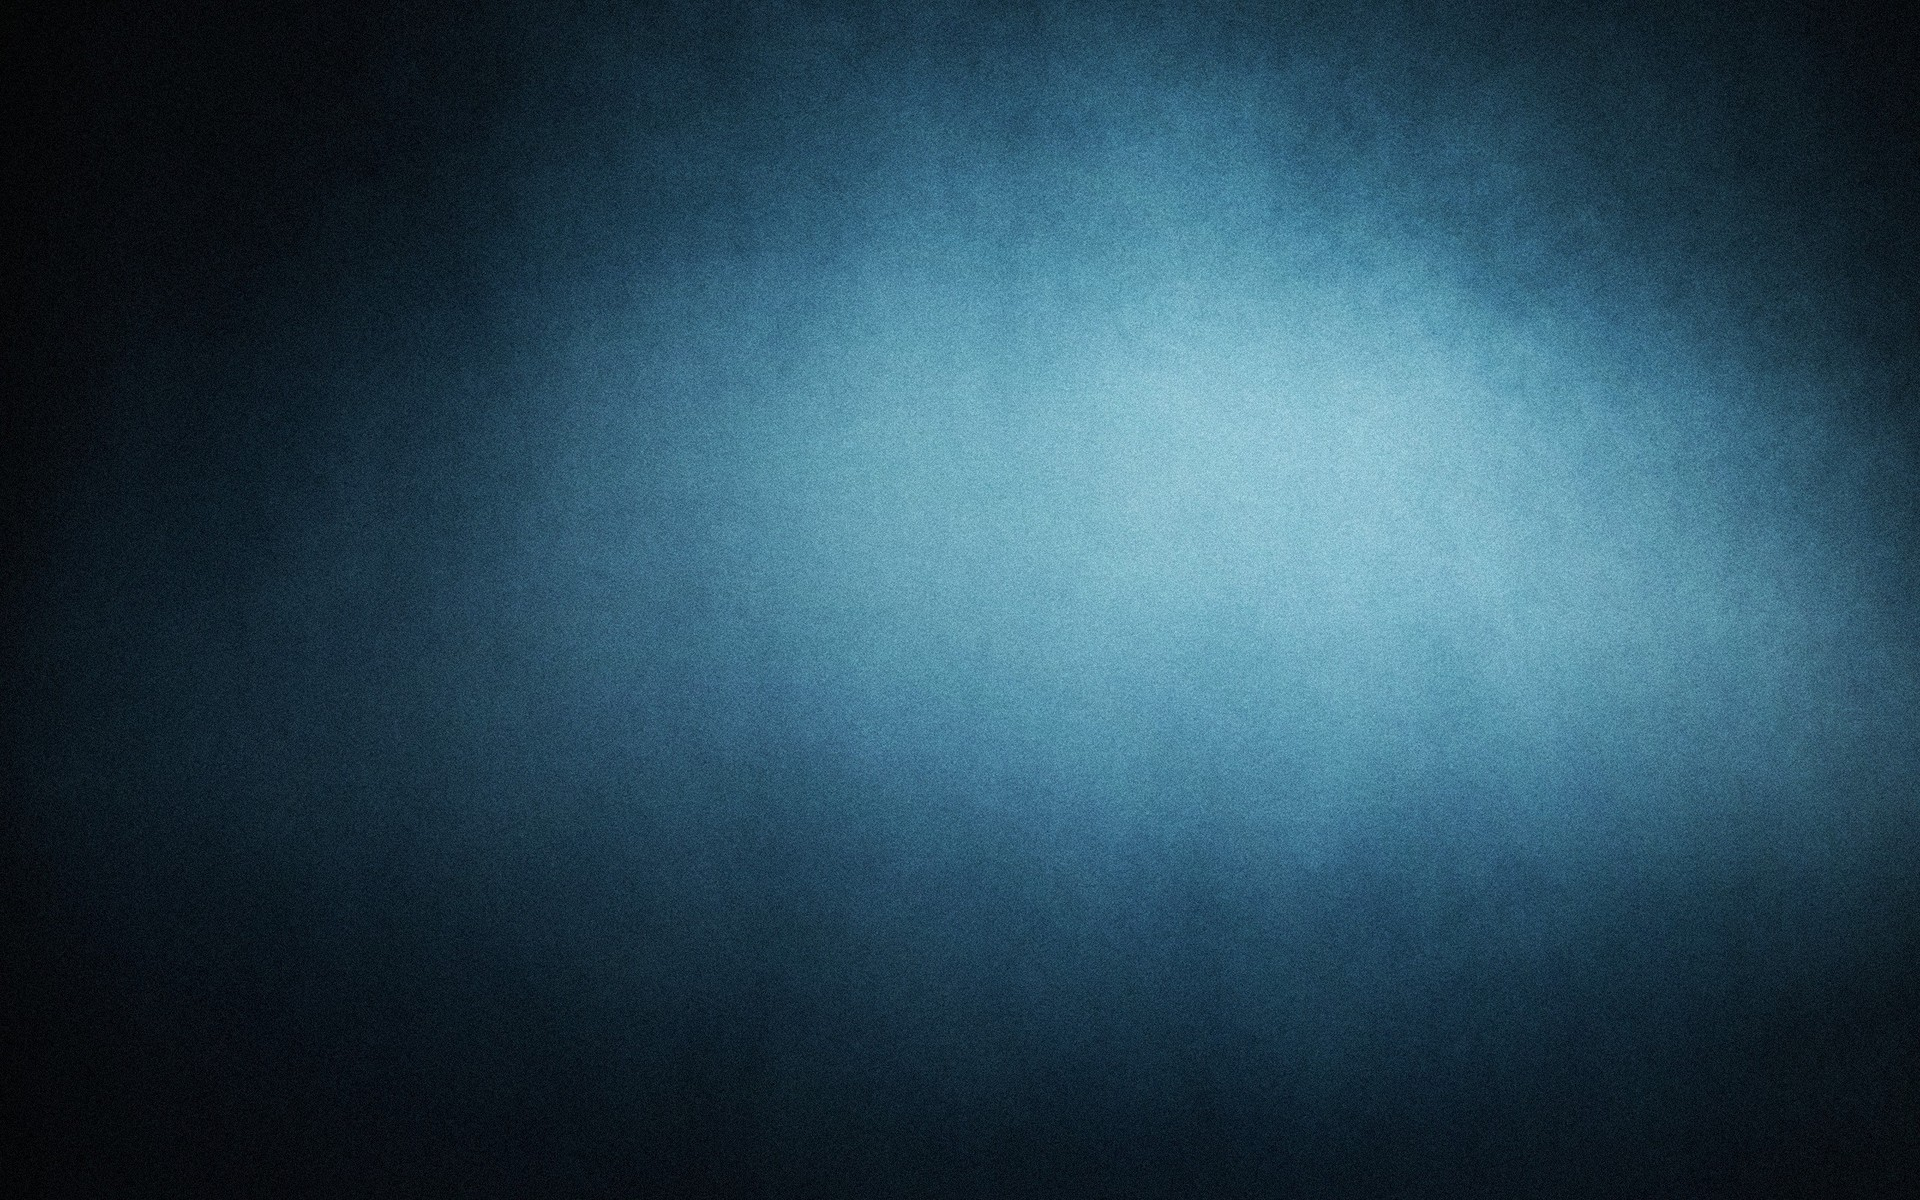 blue-texture-abstract-hd-wallpaper-1920x1200-1211